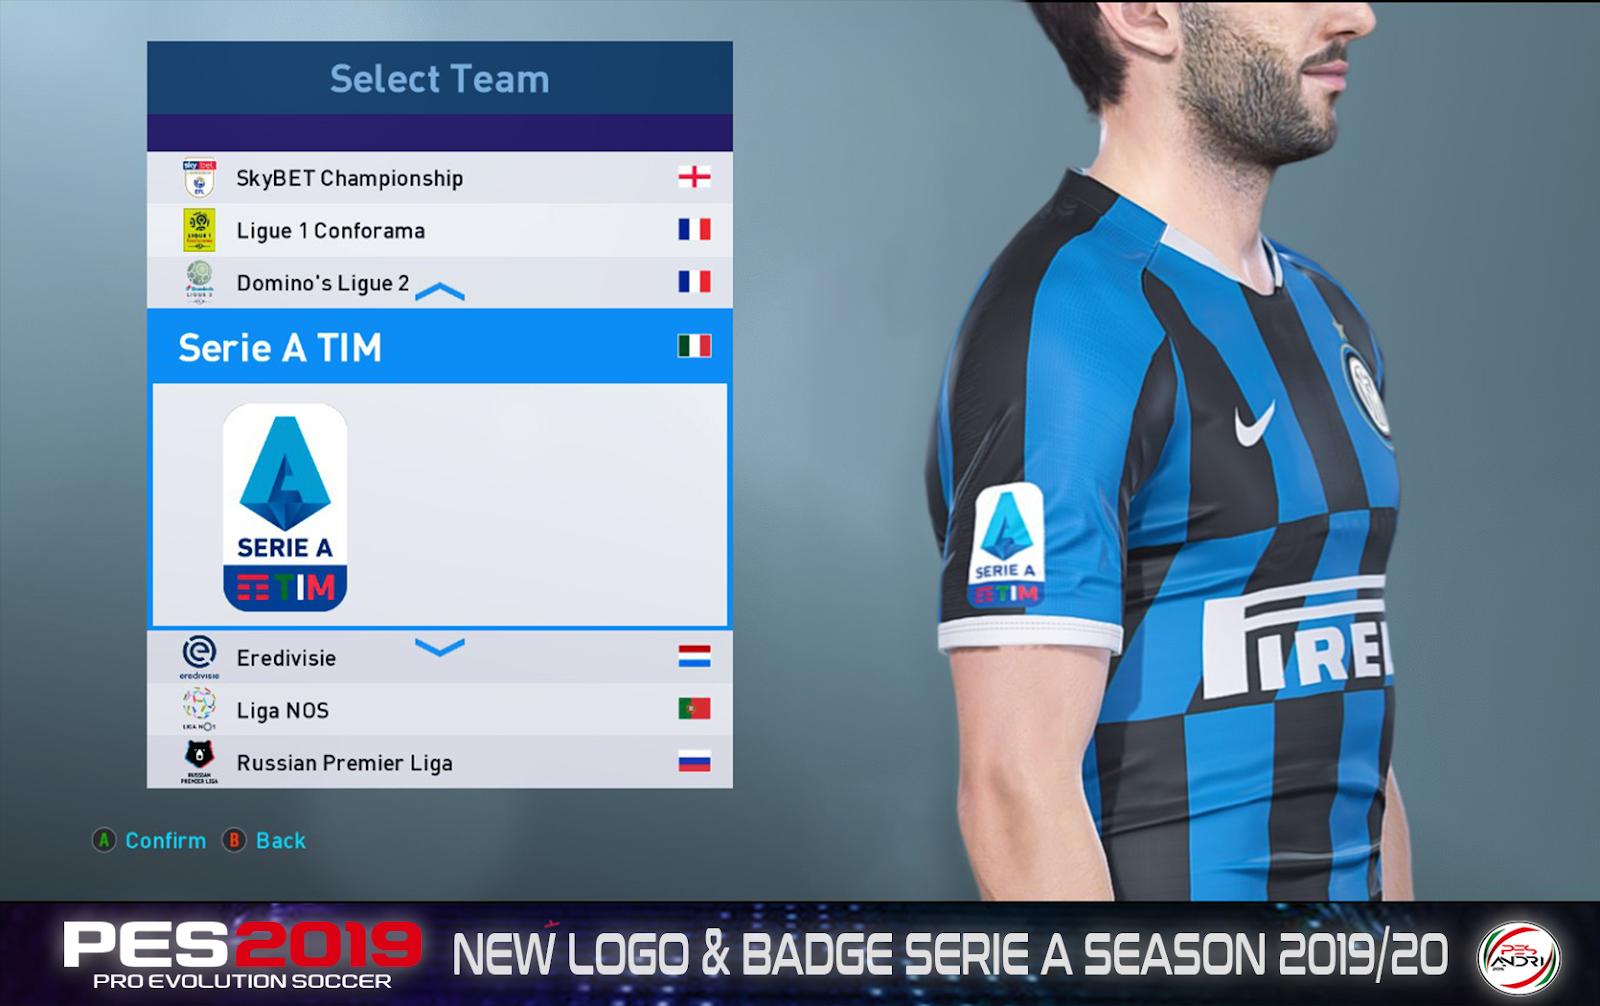 PES ANDRI: PES 2019 New Logo & Badge Serie A Season 2019/20